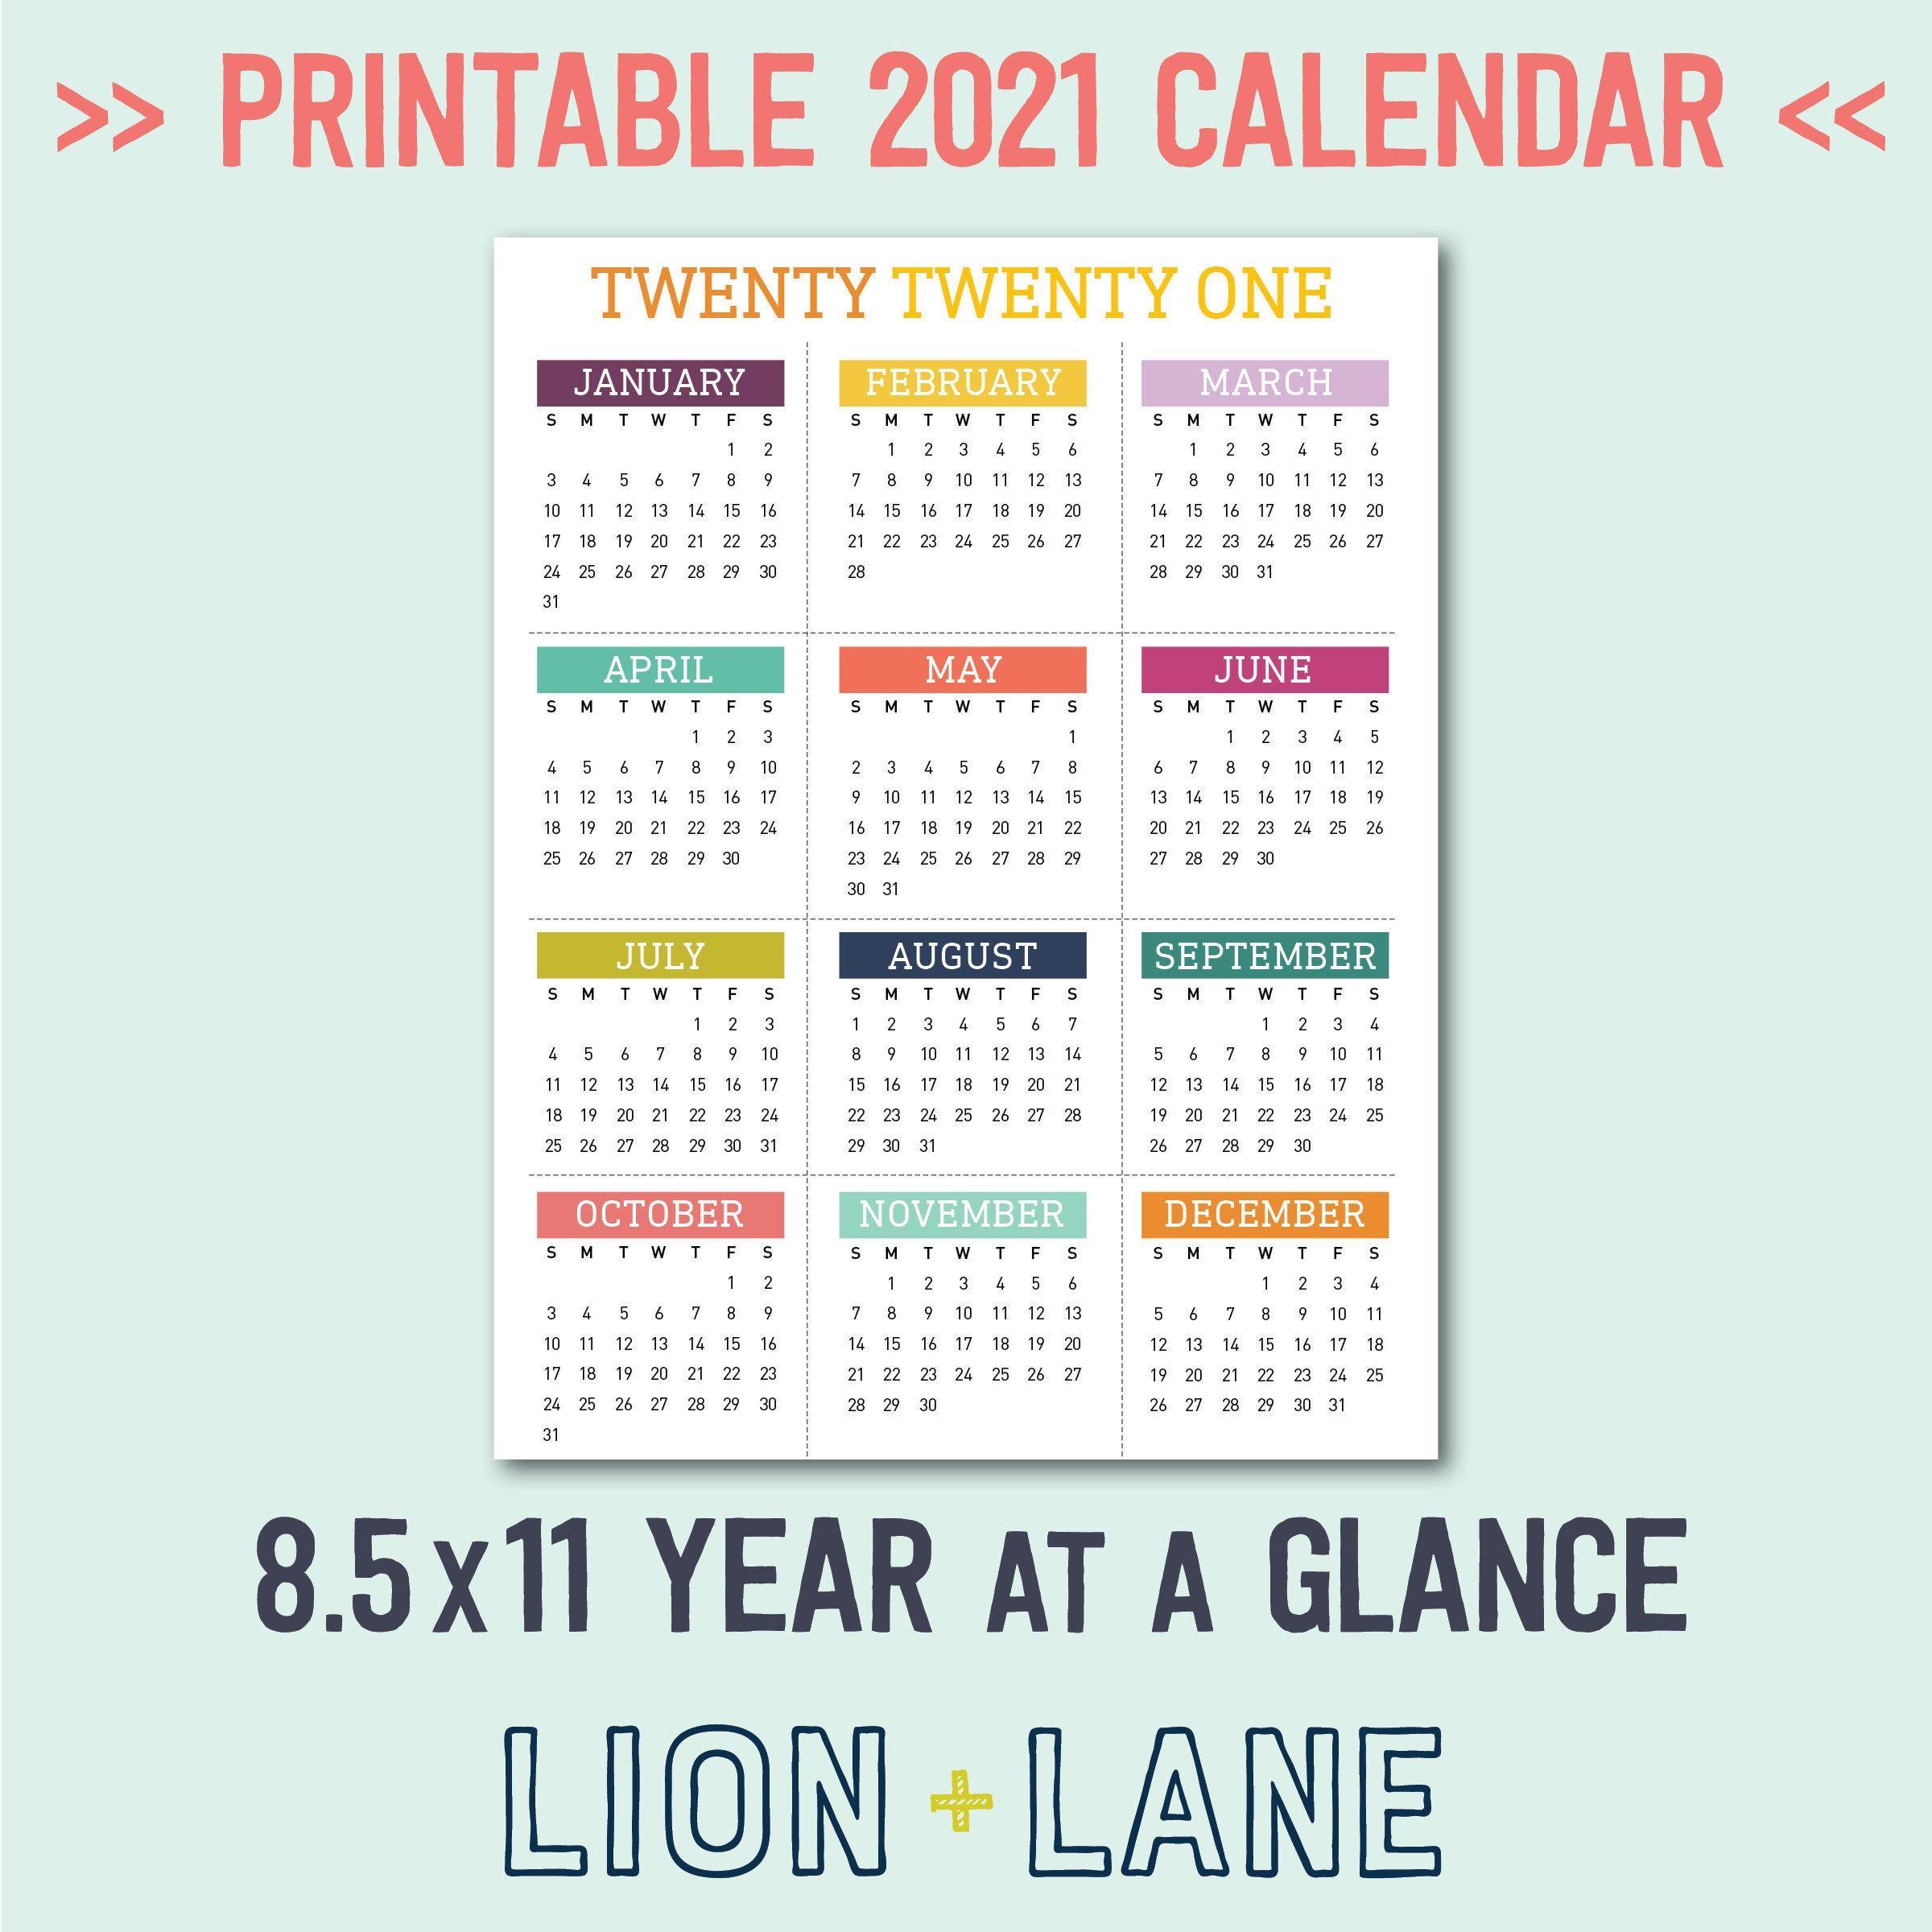 2021 Printable Calendar Year At A Glance 8 5x11 Letter Etsy In 2020 Printable Yearly Calendar Yearly Calendar Printable Calendar